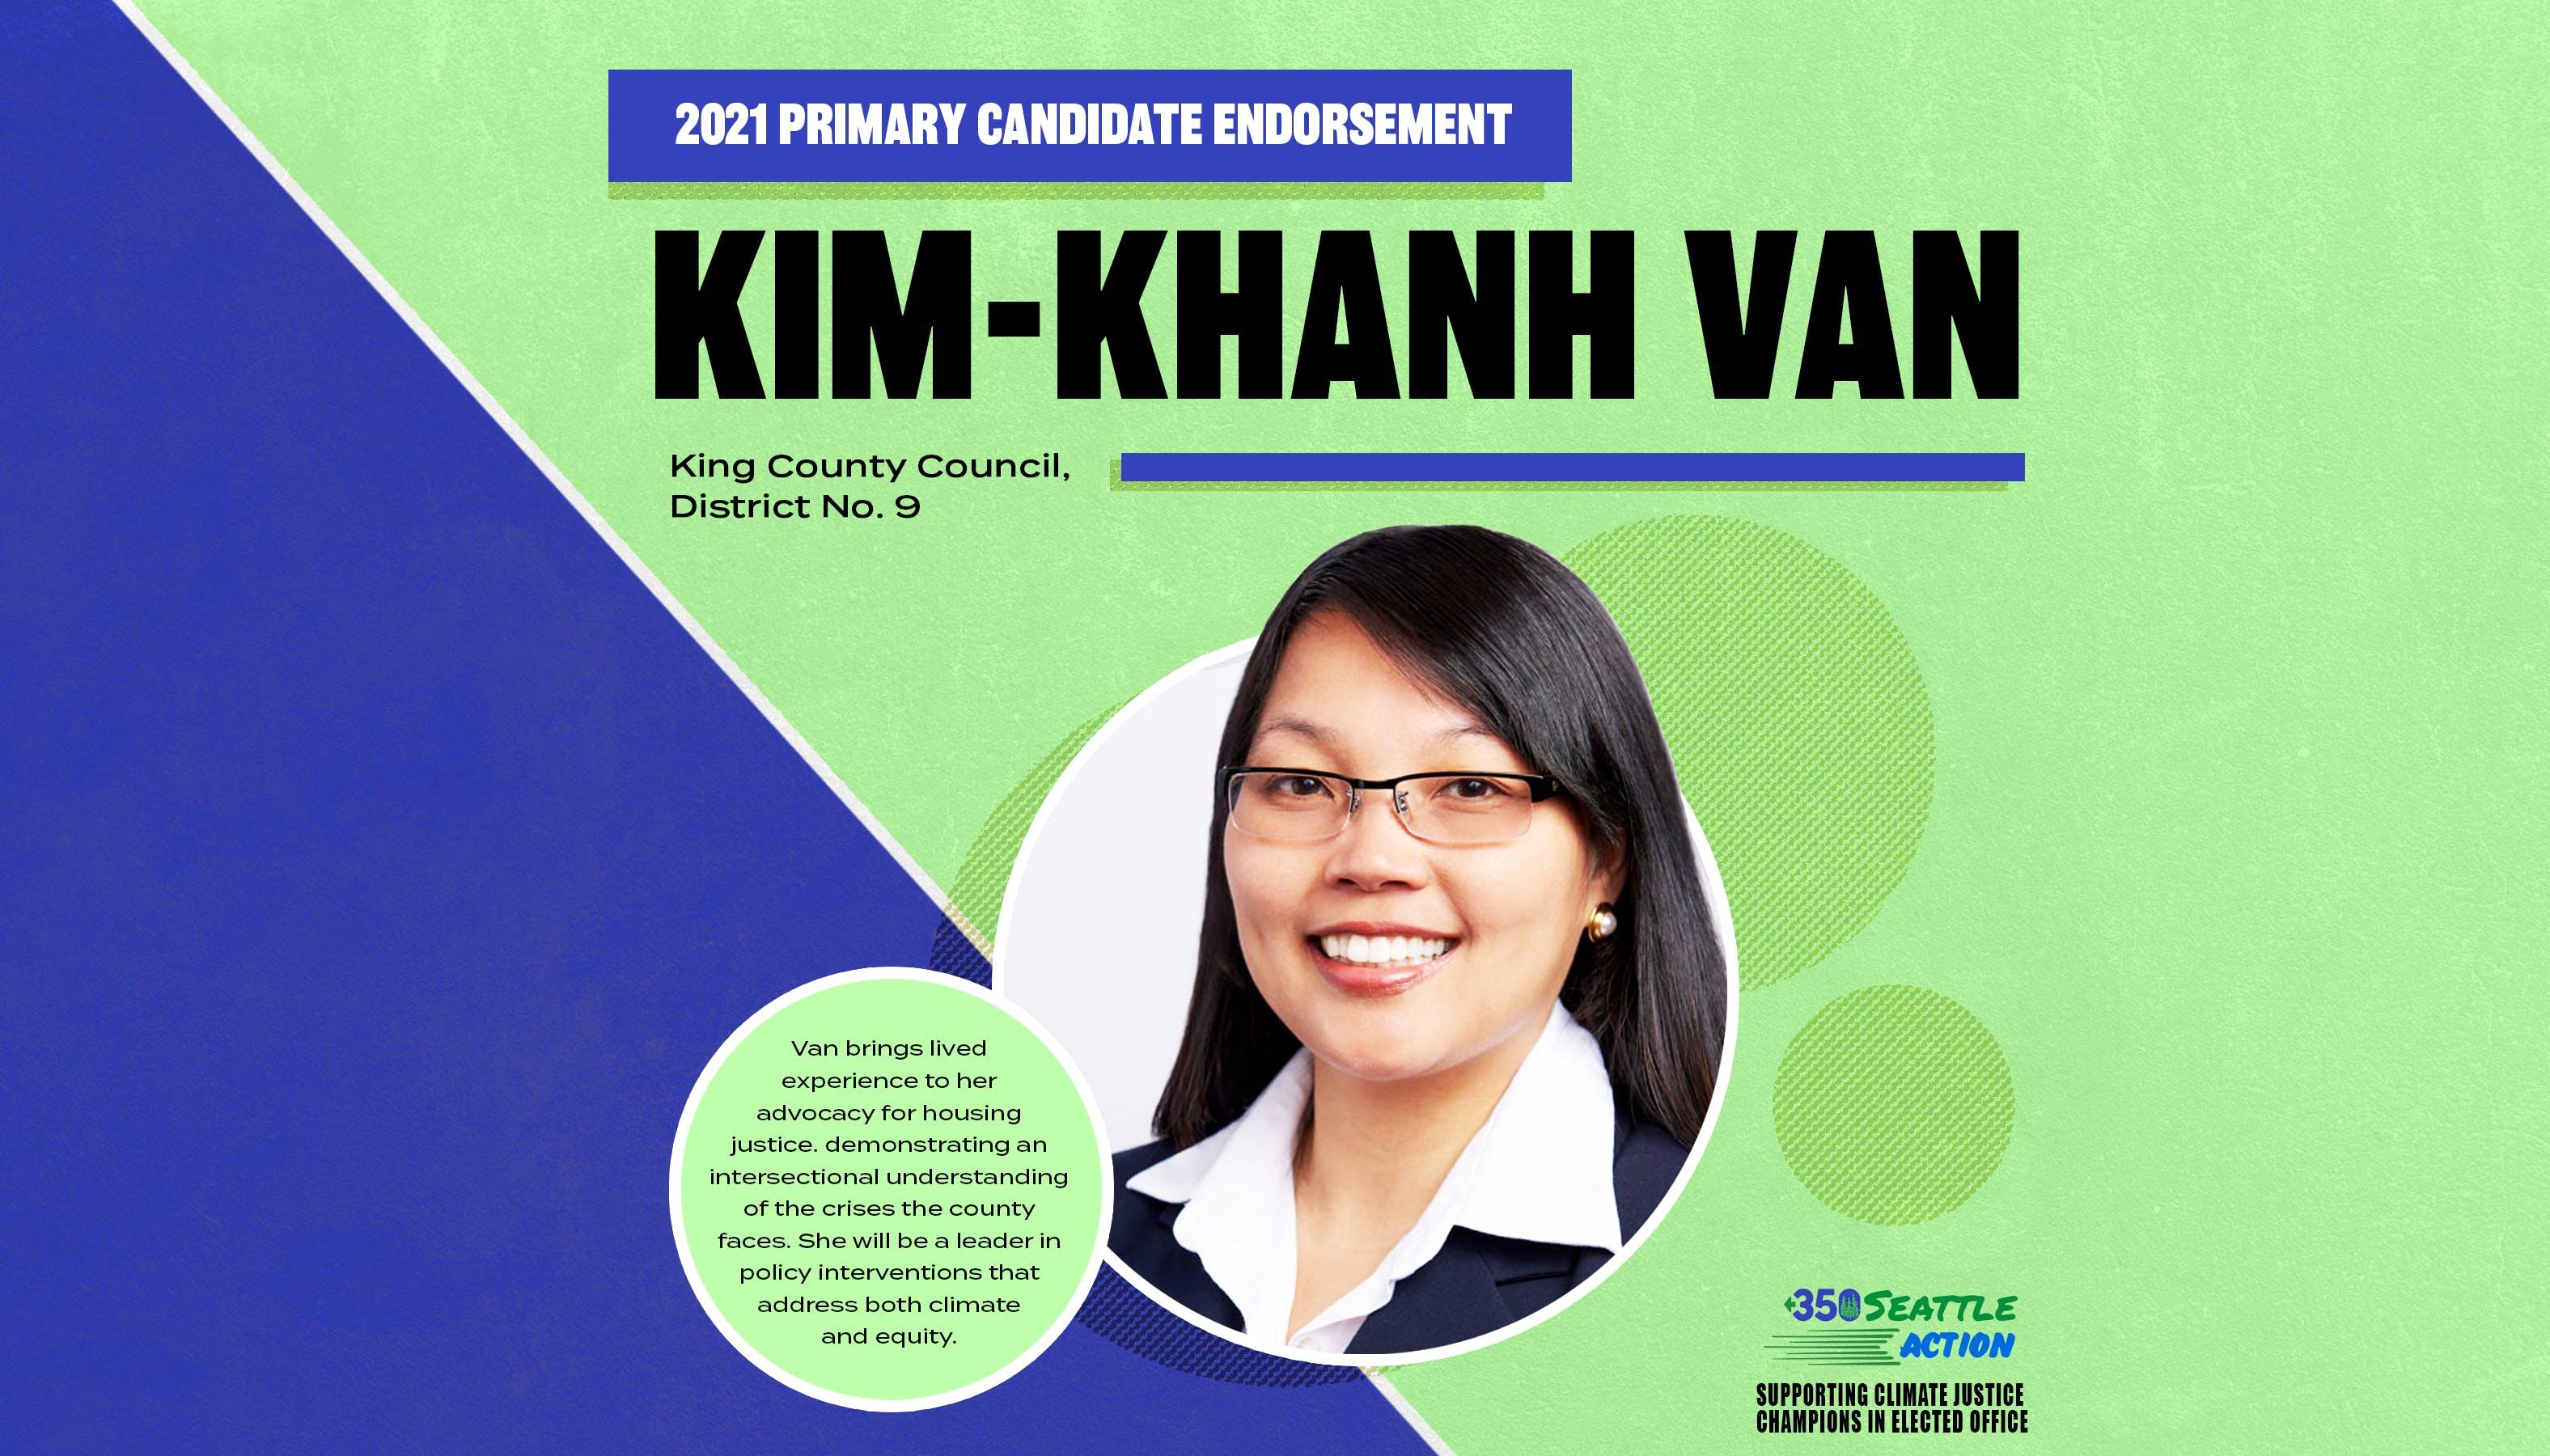 Kim-Khanh Van Twitter.png